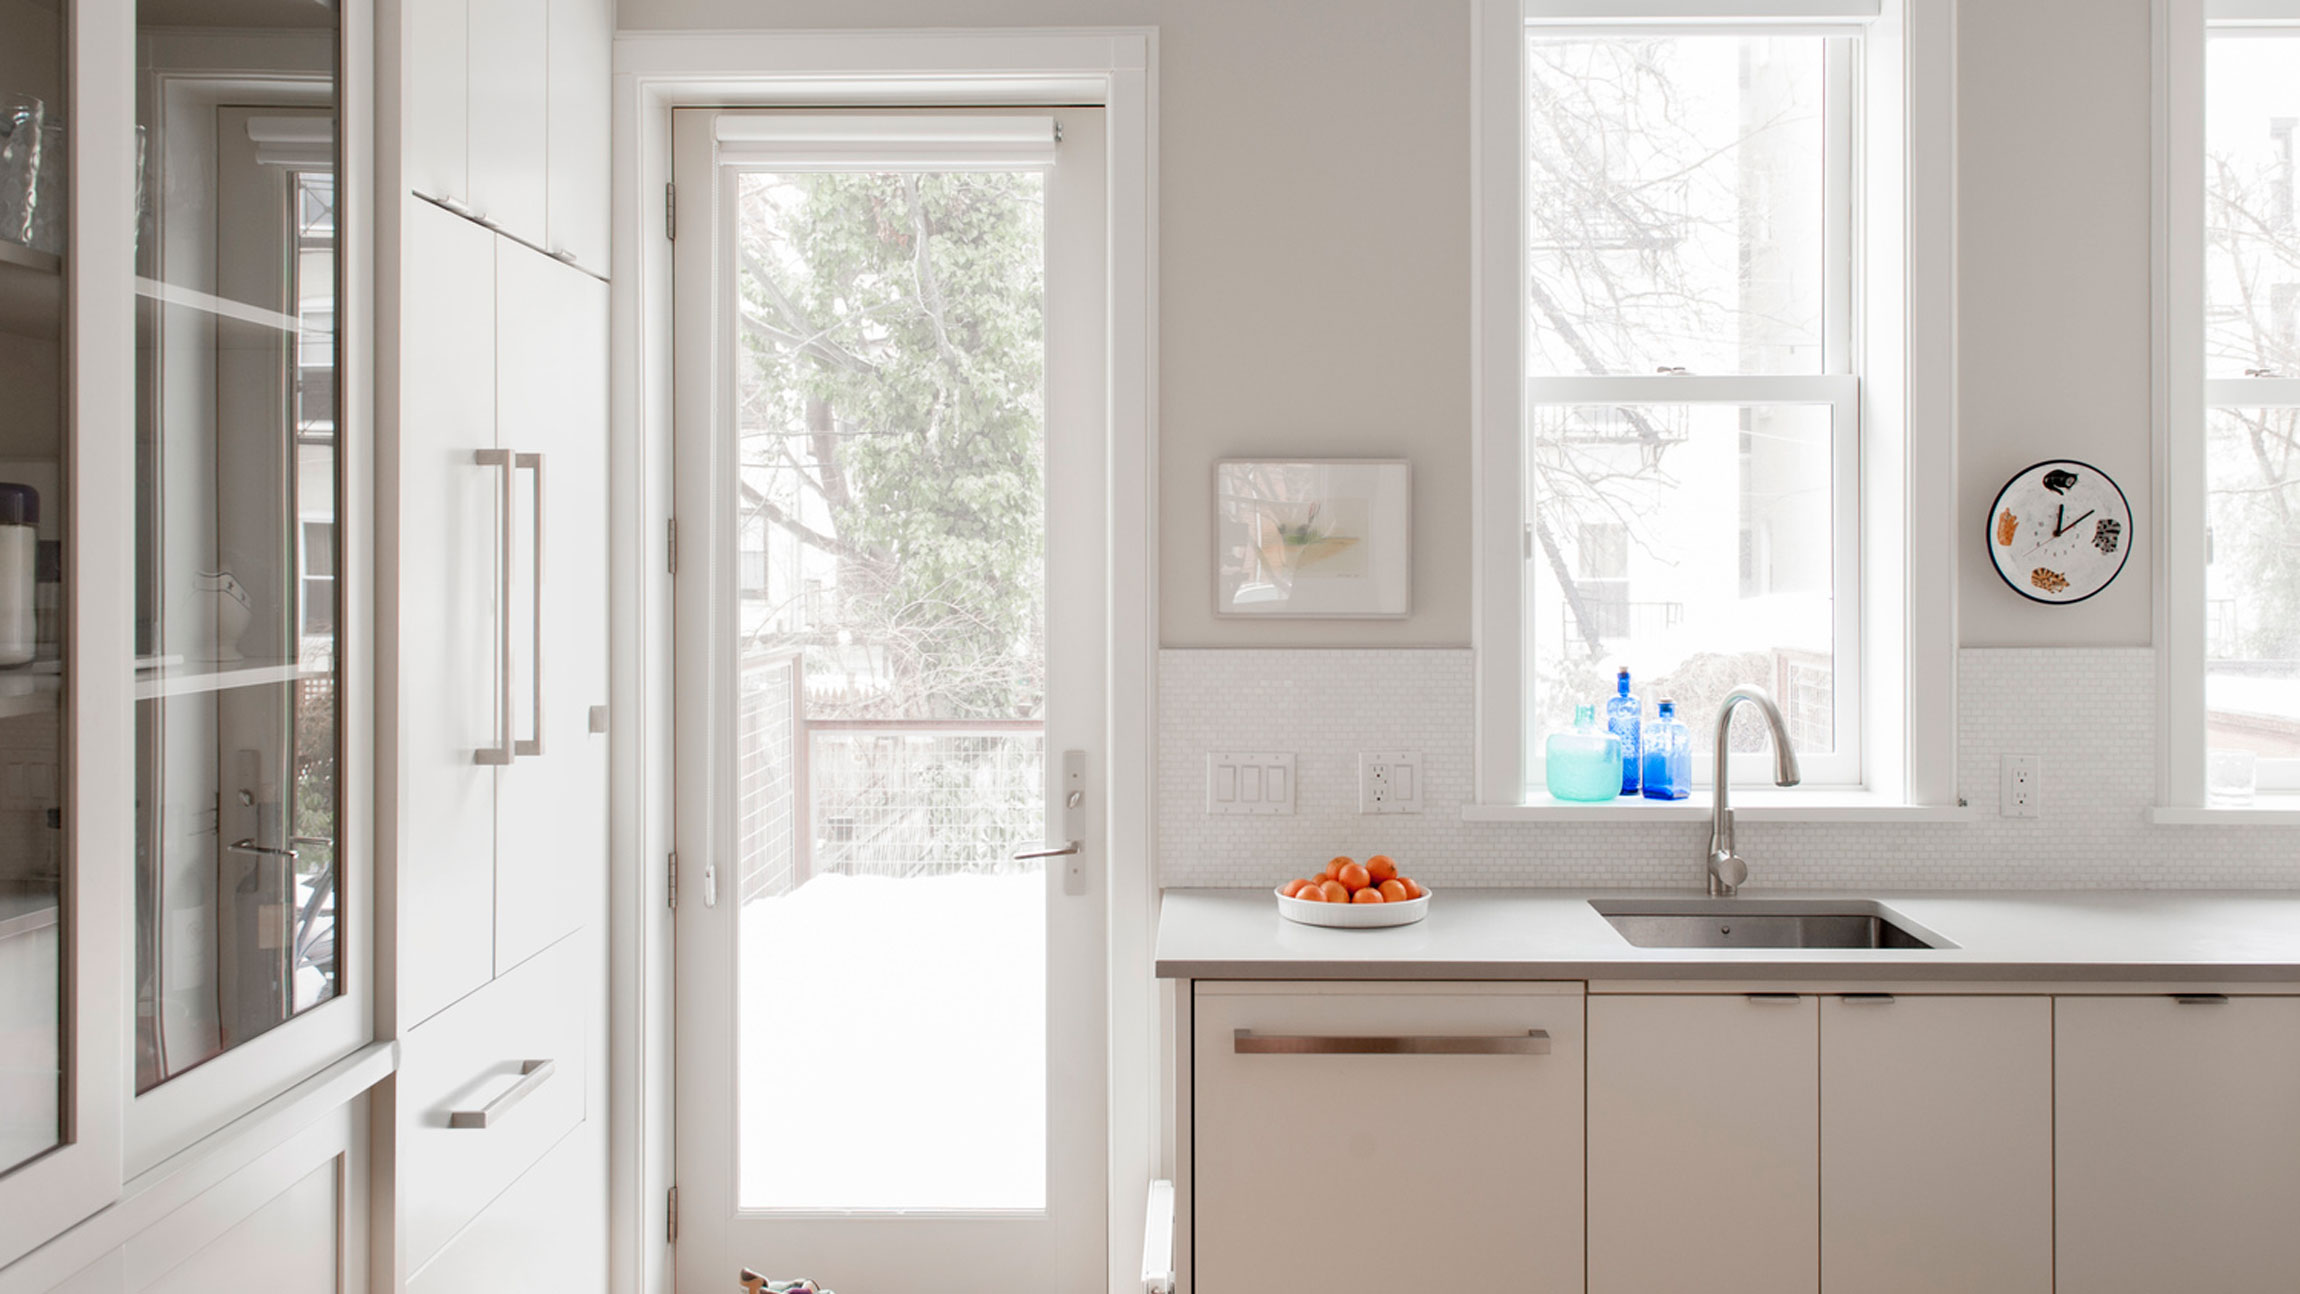 Buy-custom-laundry-room-cabinets-in-honey-brook-pa & Buy-custom-laundry-room-cabinets-in-honey-brook-pa - MK Designs ...